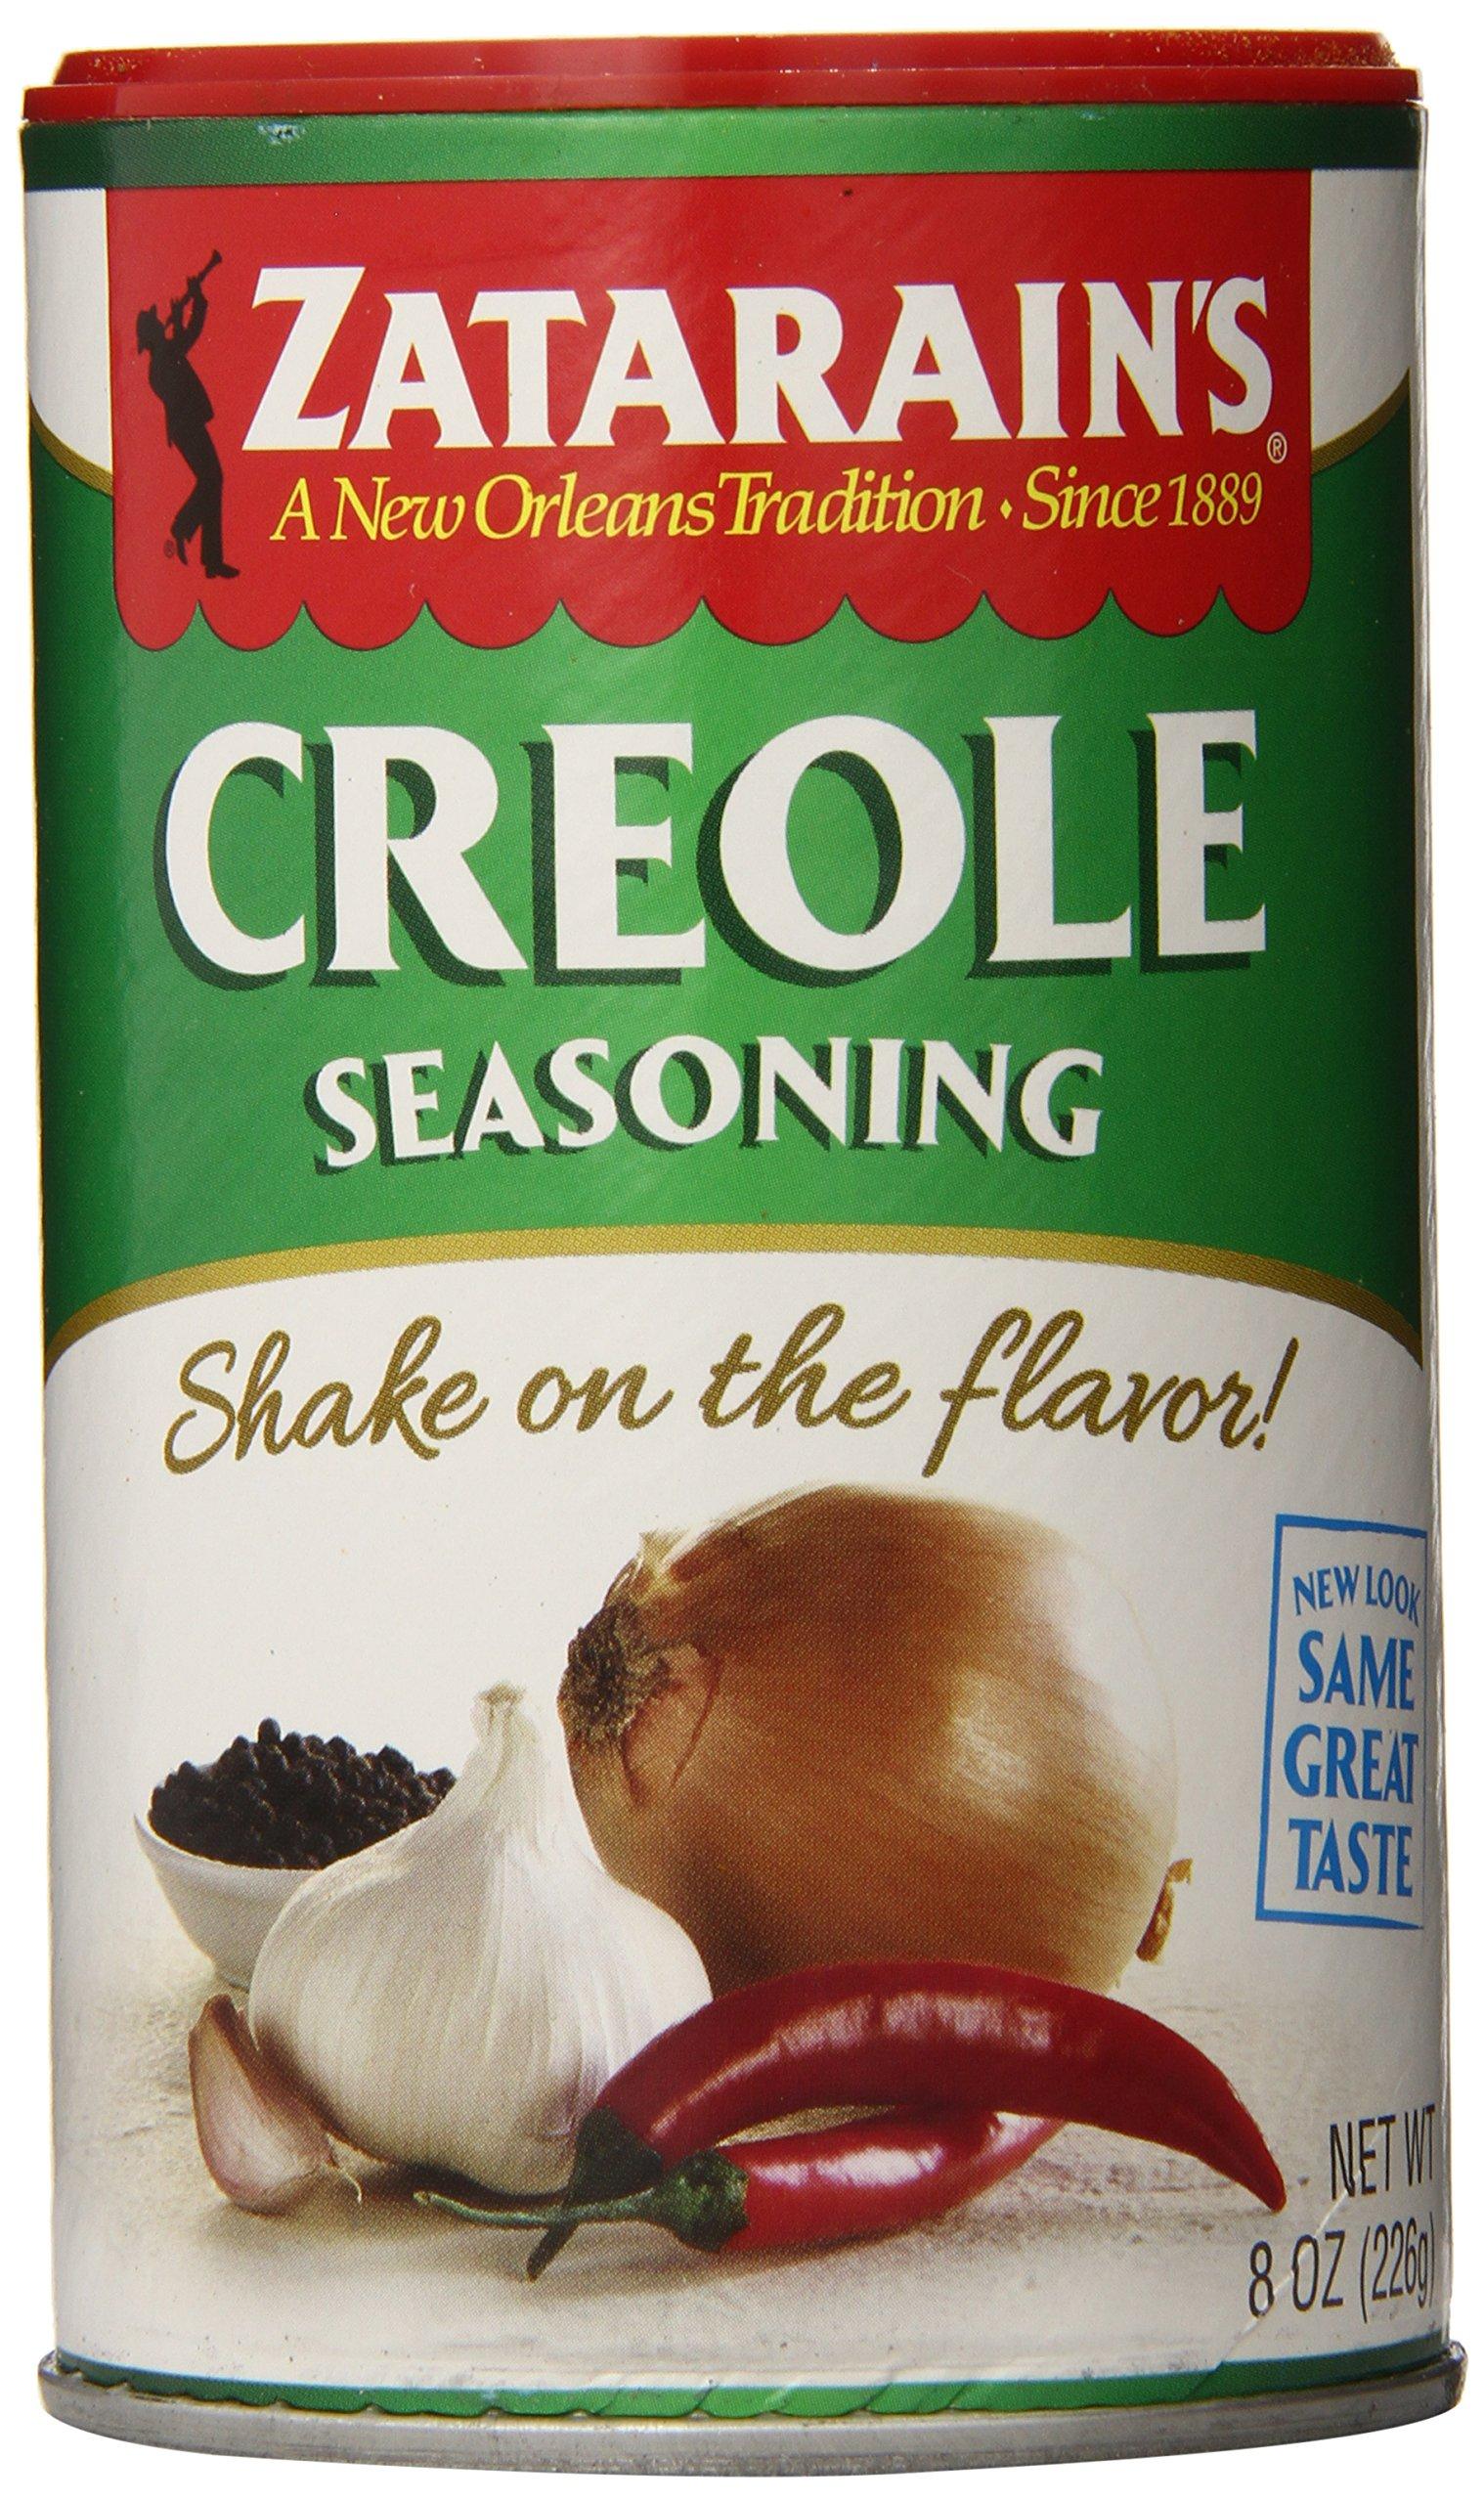 Zatarain's New Orleans Style Creole Seasoning, 8 oz (Pack of 12)